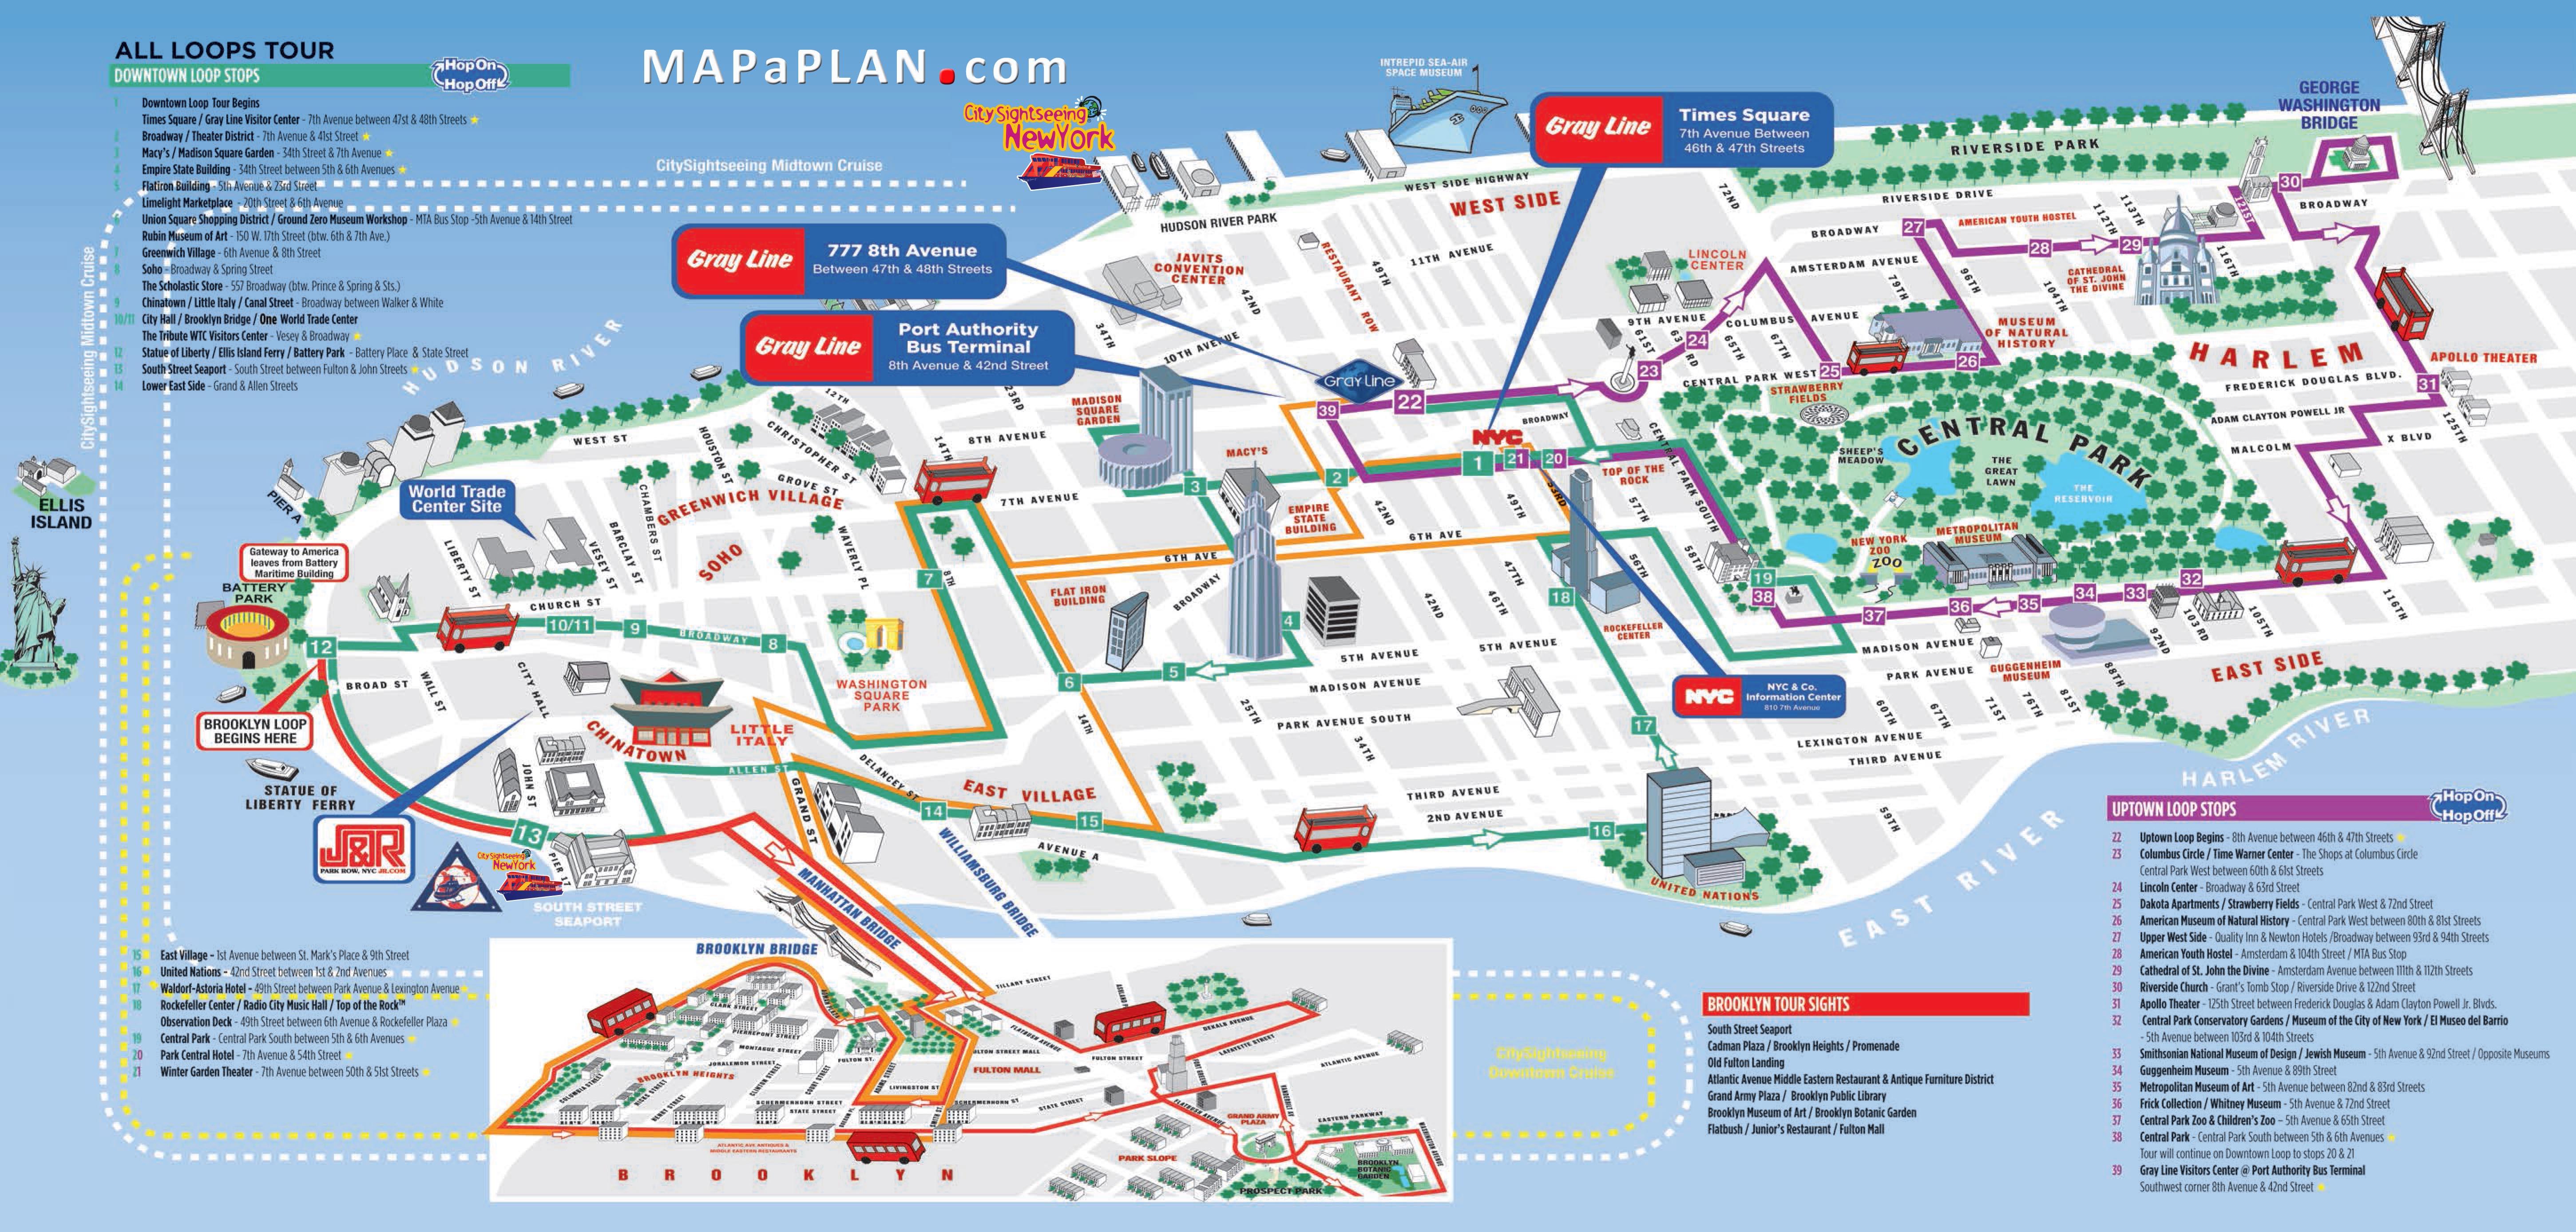 Tourist Map Of New York City Printable   Travel Maps And Major - Printable Walking Map Of Manhattan